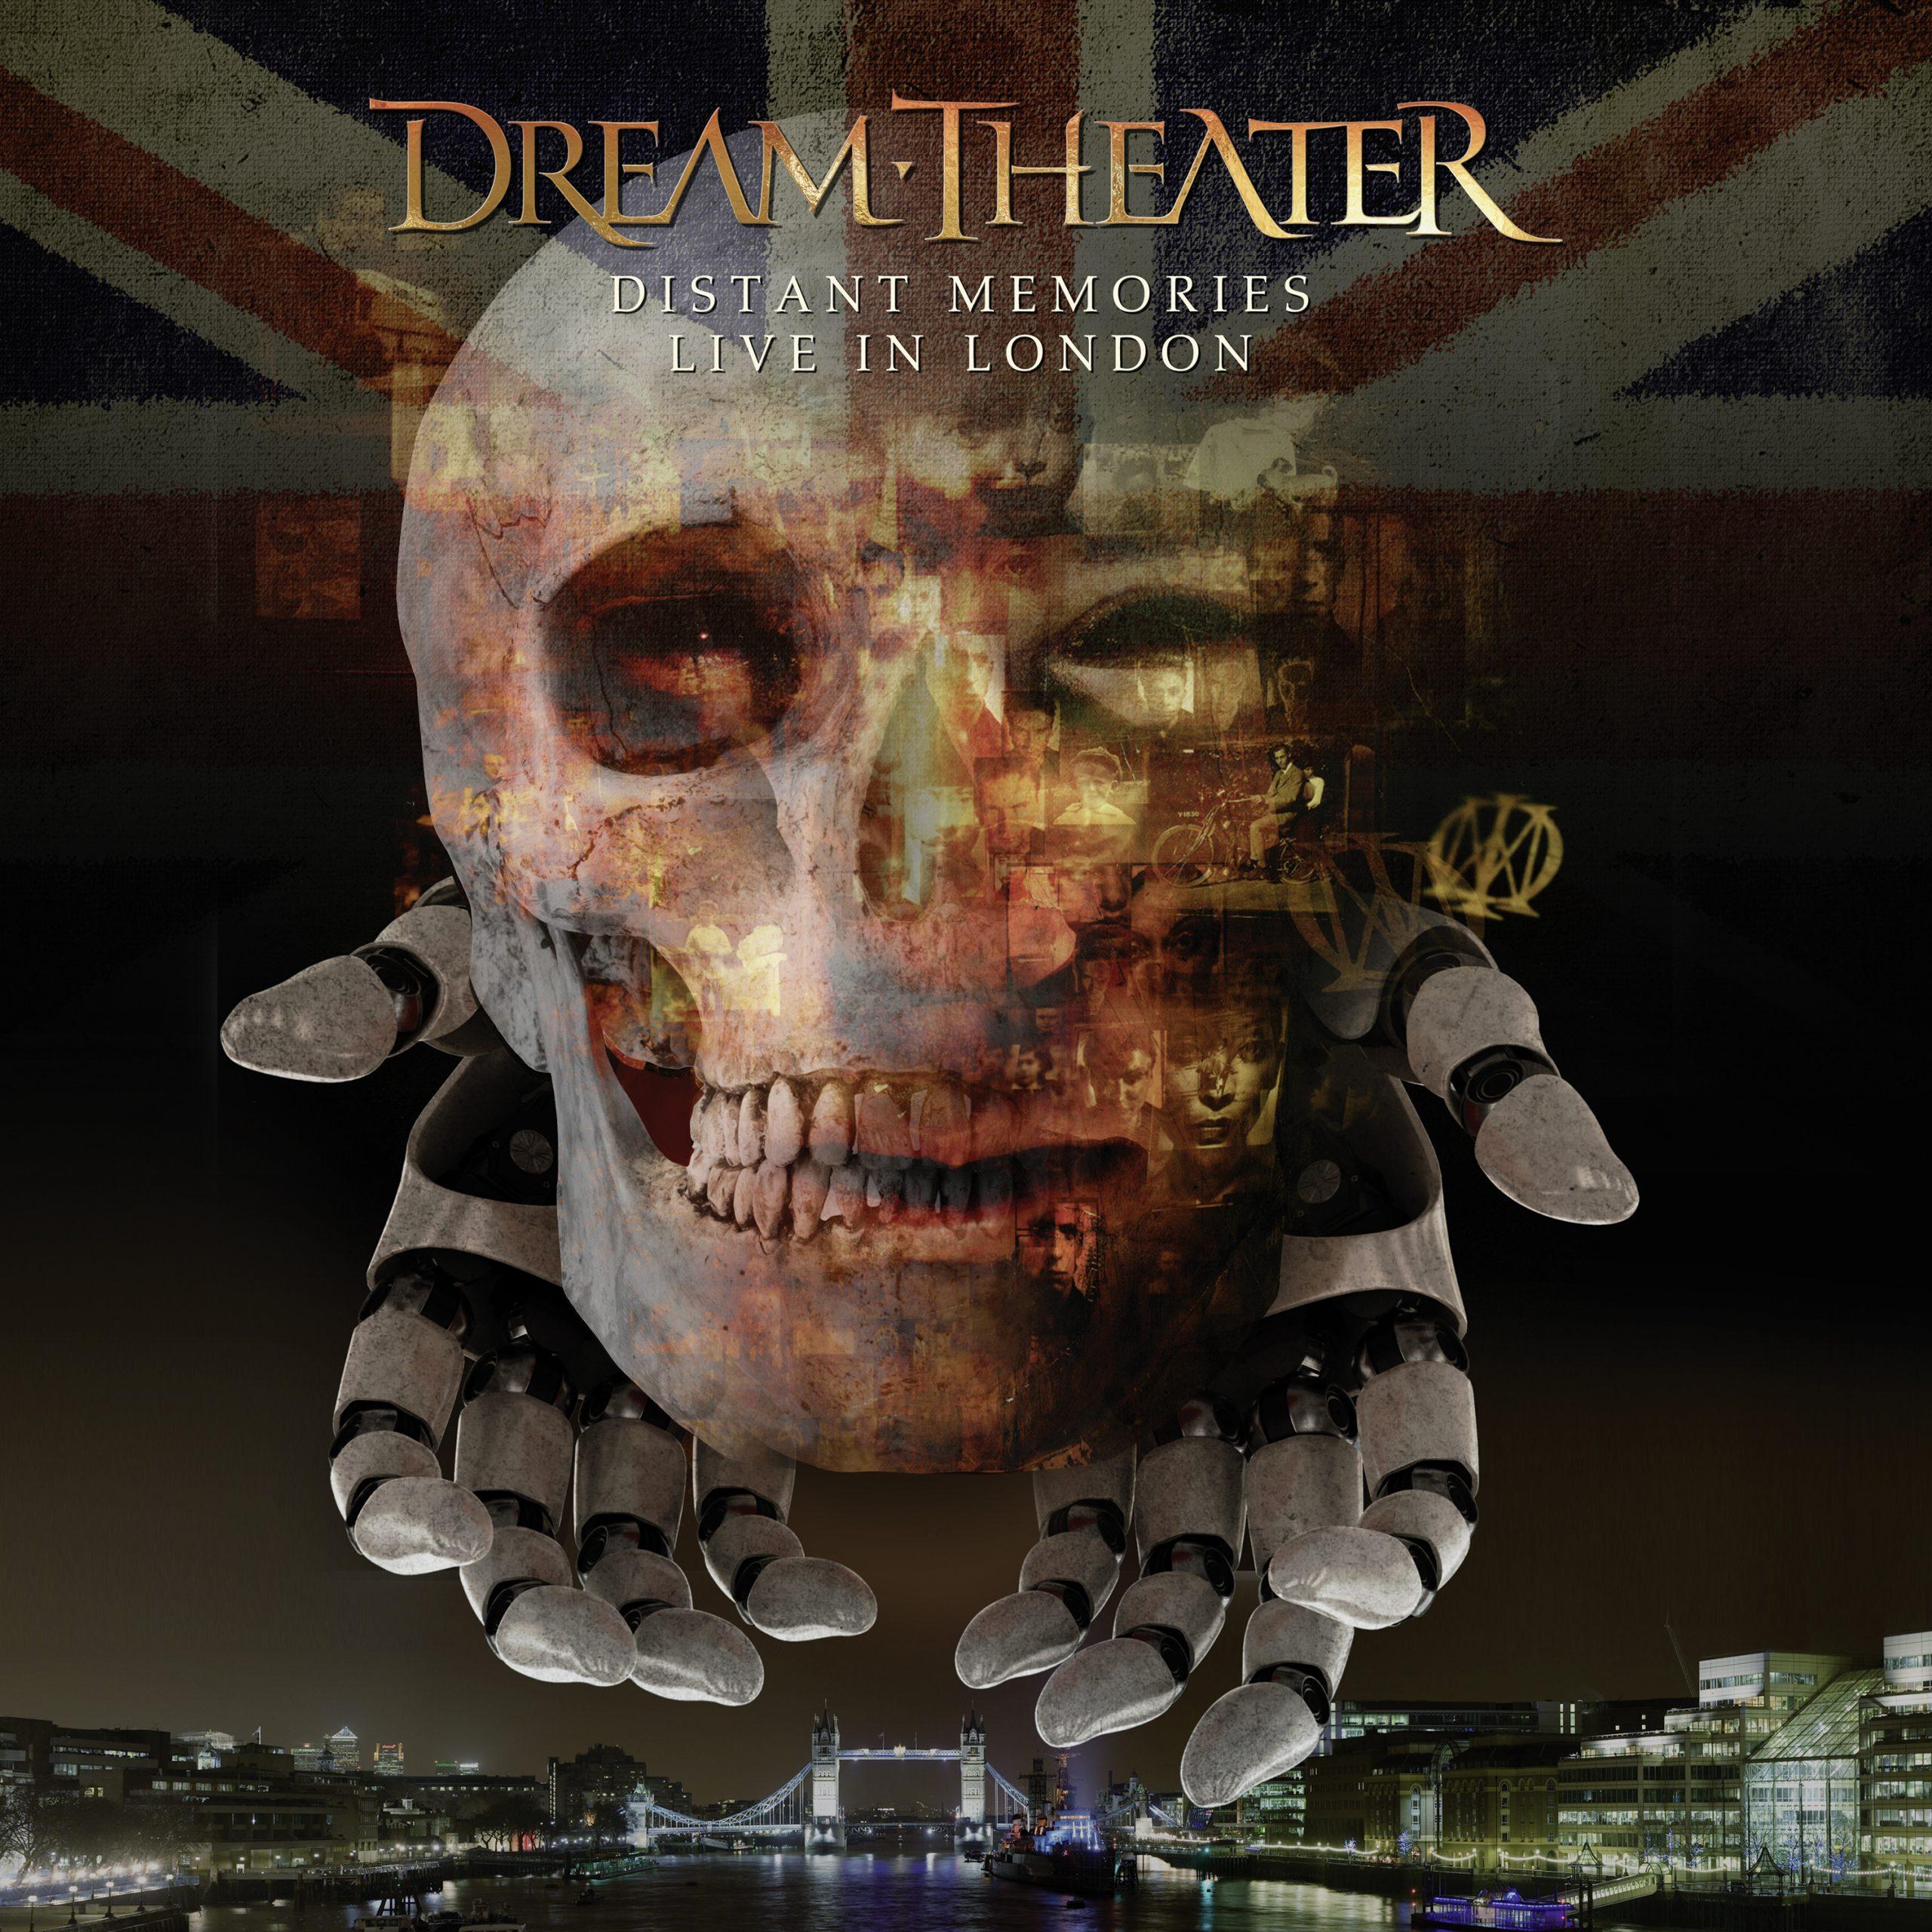 dream-theater-distant-memories-live-in-london-neues-livealbum